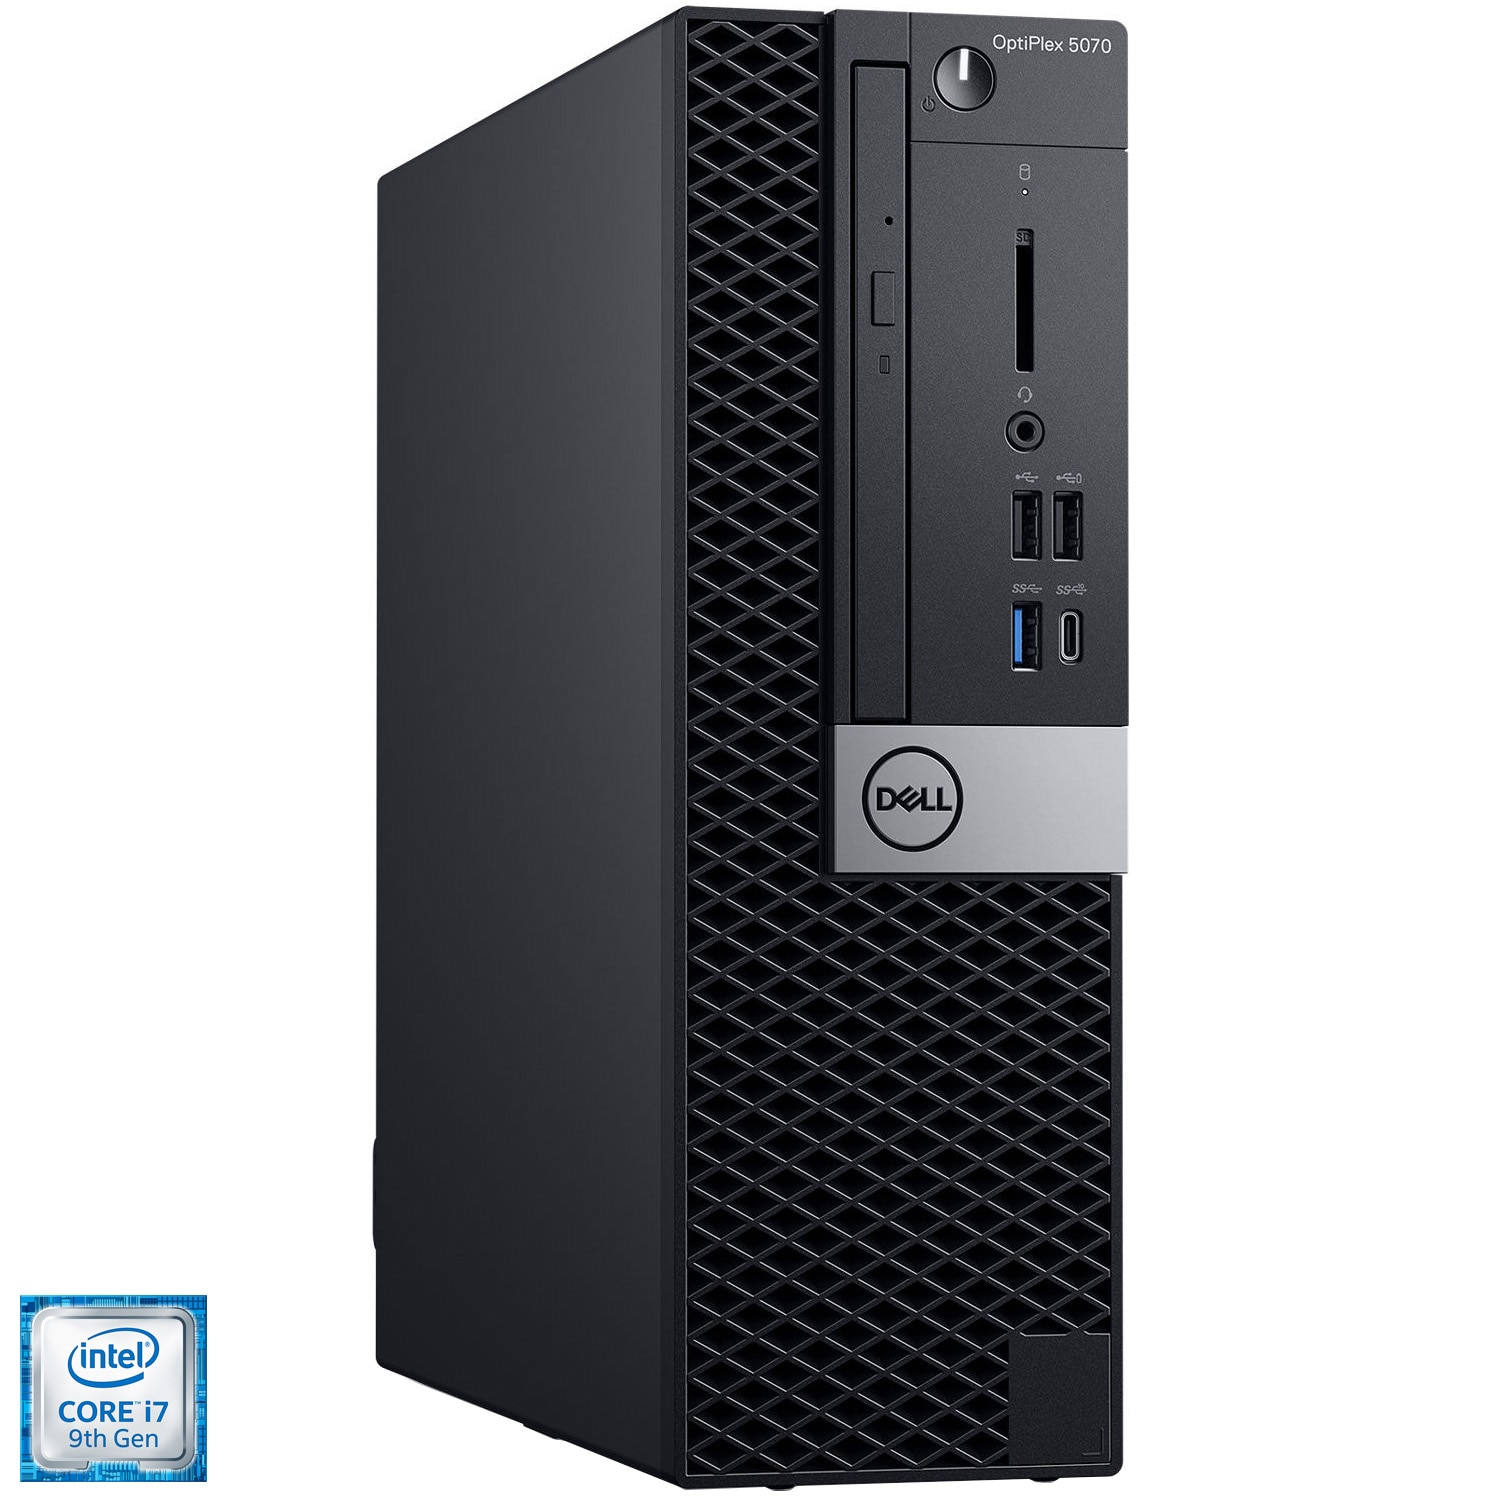 Fotografie Sistem Desktop PC Dell OptiPlex 5070 SFF cu procesor Intel® Core™ i7-9700 pana la 4.70 GHz, Coffee Lake, 16GB DDR4, 256GB SSD, Intel® UHD Graphics 630, Microsoft Windows 10 Pro